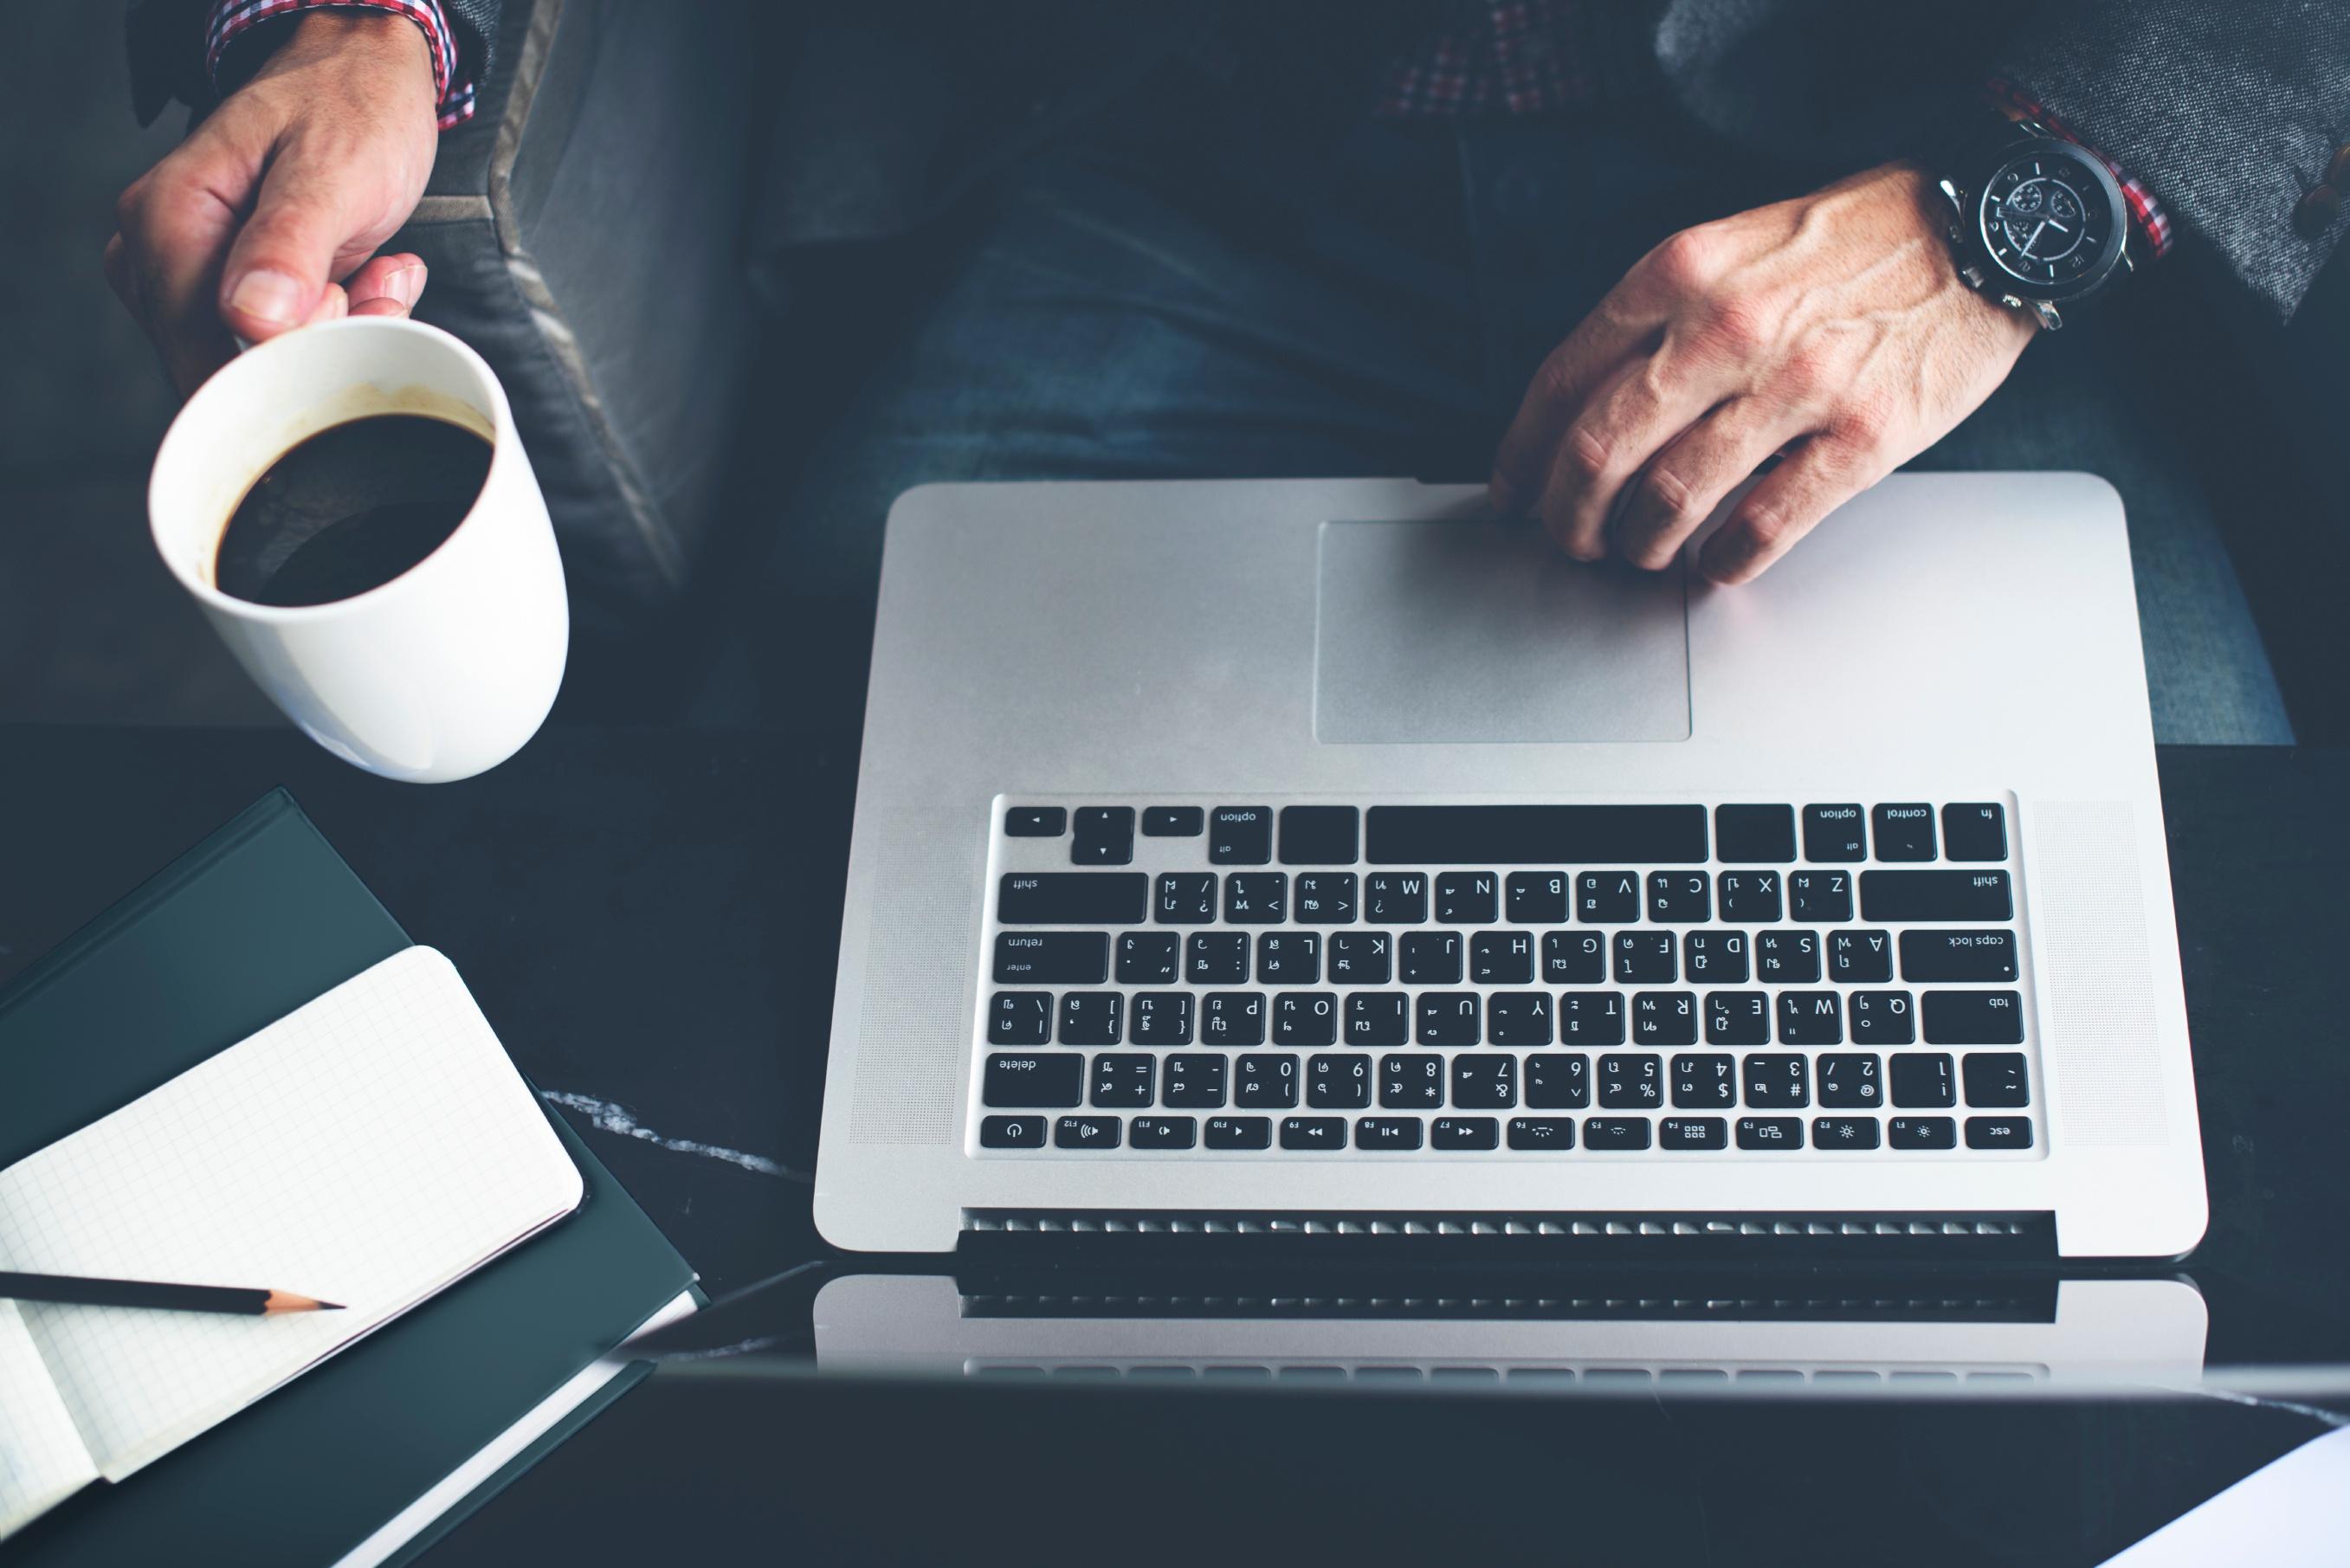 Man-Computer-Laptop-Coffee-Cafe-Concept-000079551979_Large-1.jpg